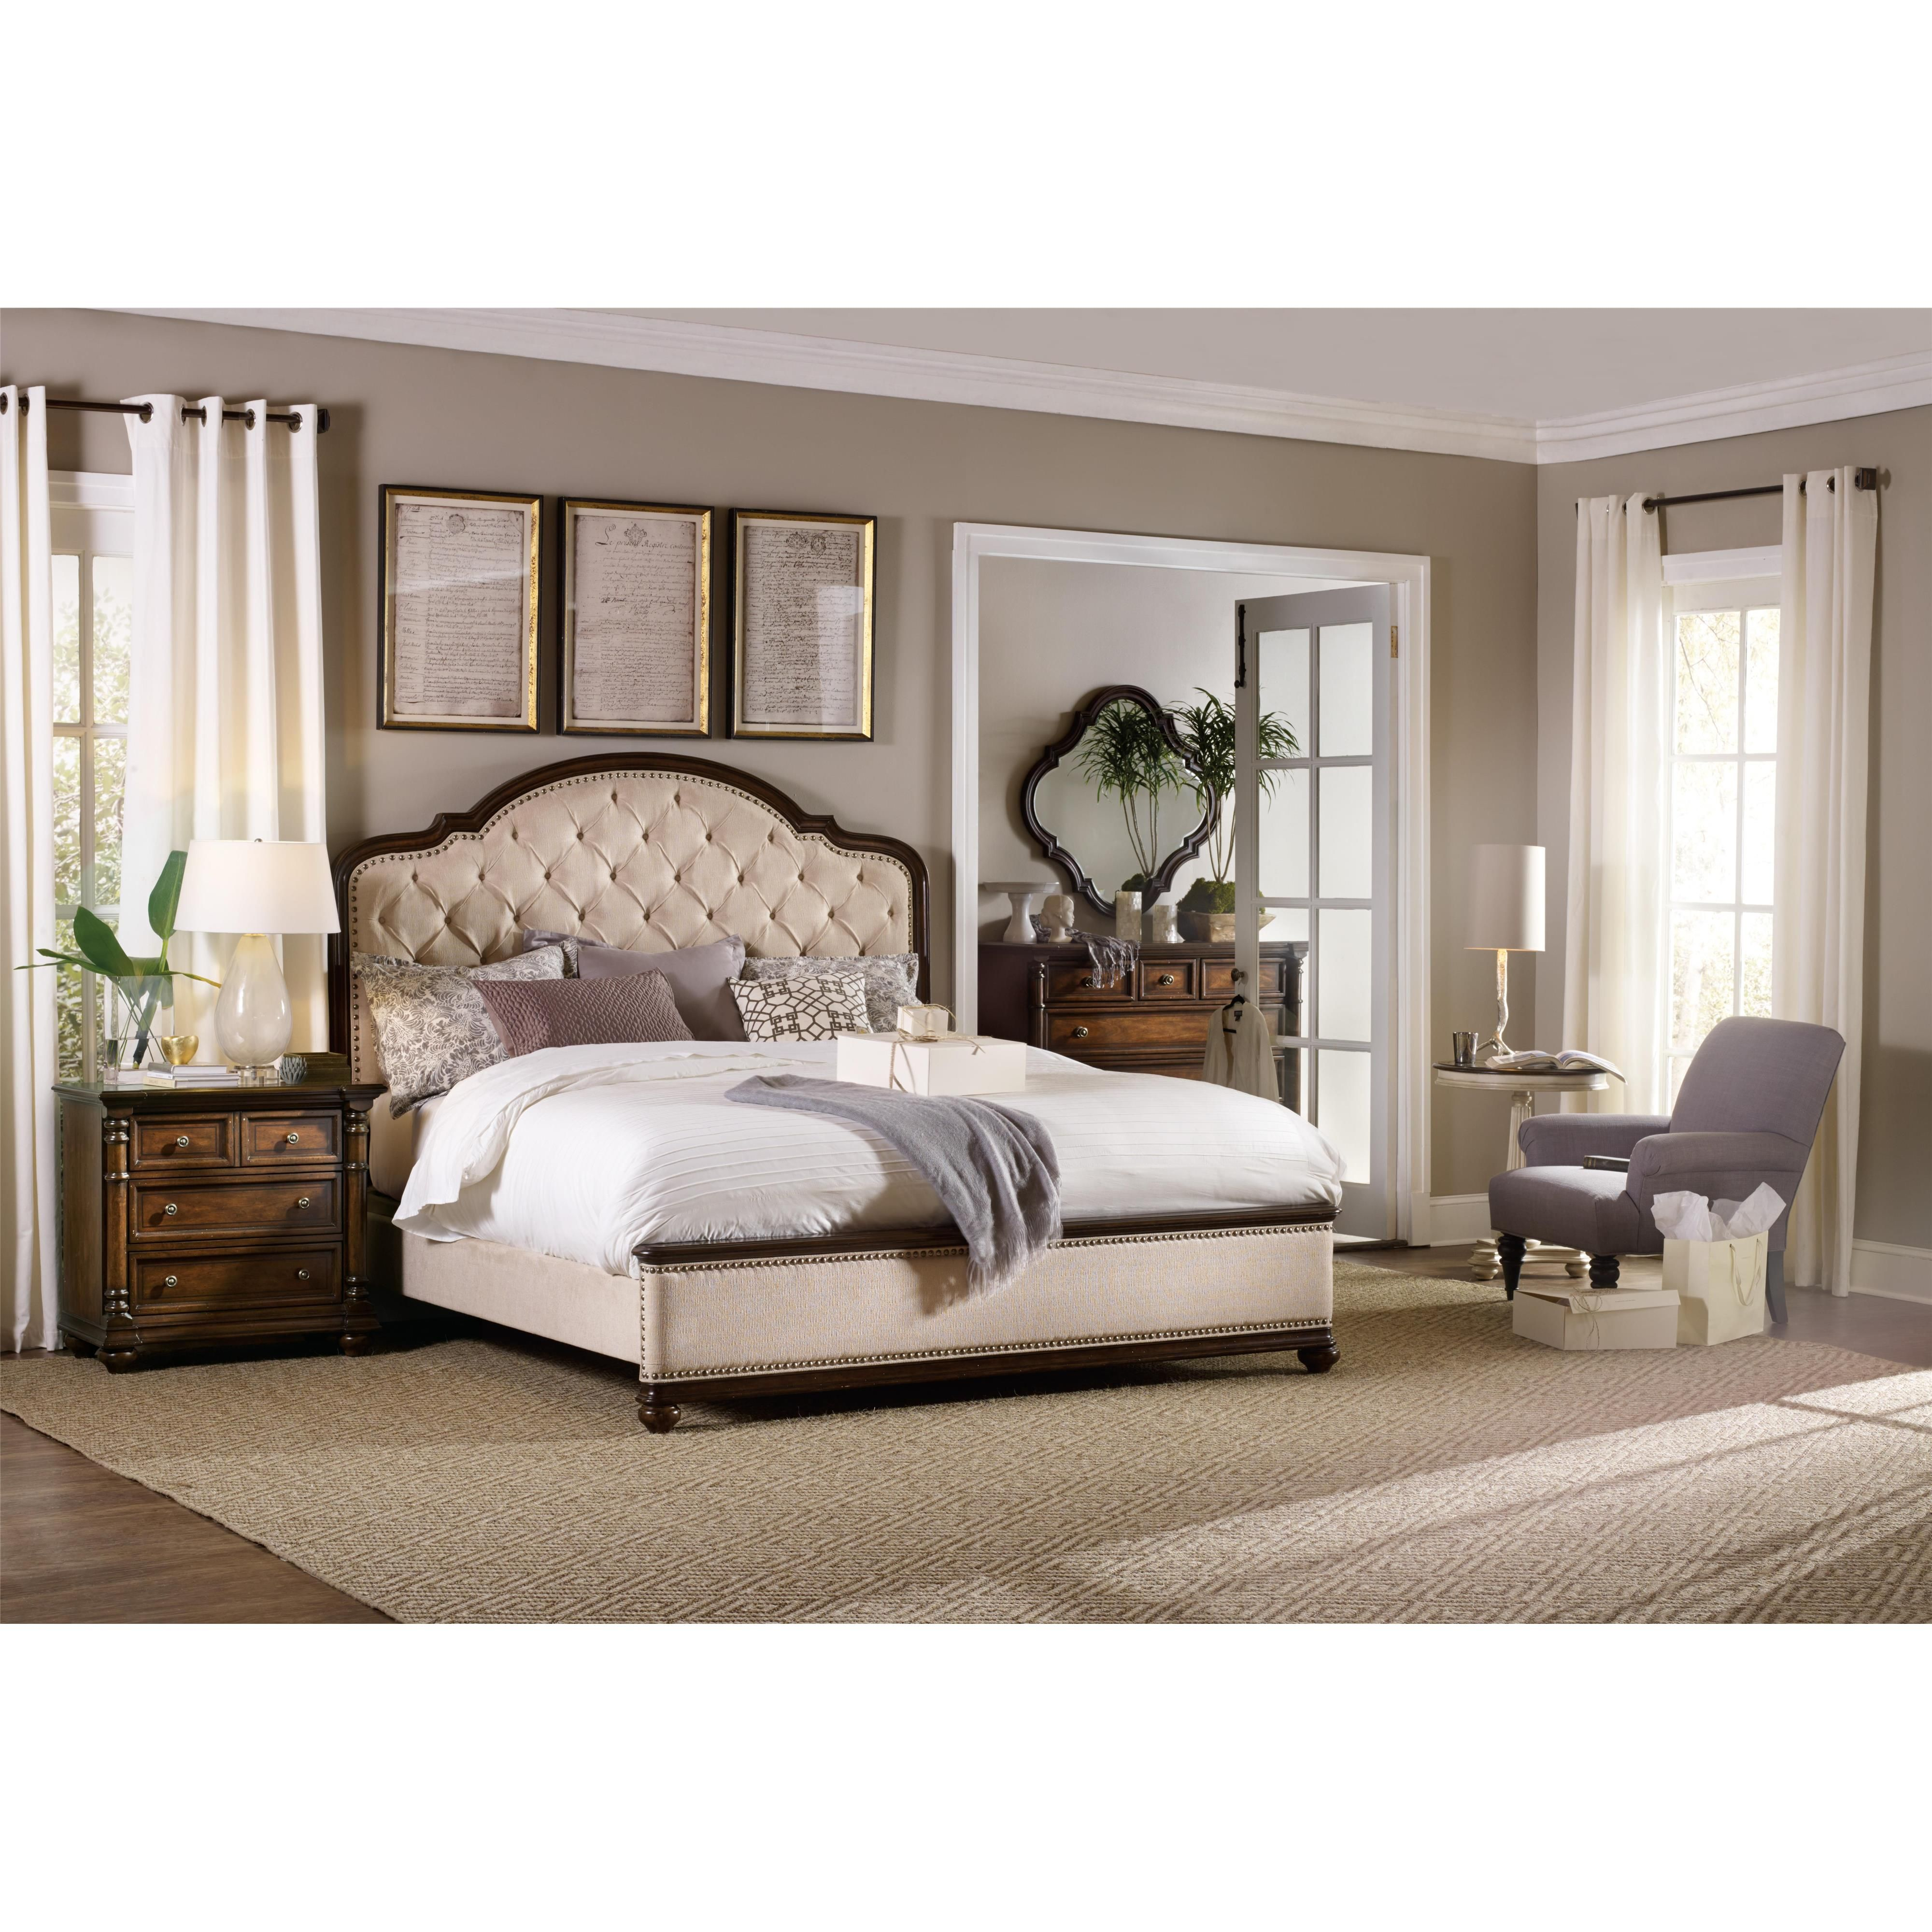 Hooker Furniture Leesburg King Size Upholstered Bed With Tufting   Wayside  Furniture   Upholstered Bed Akron